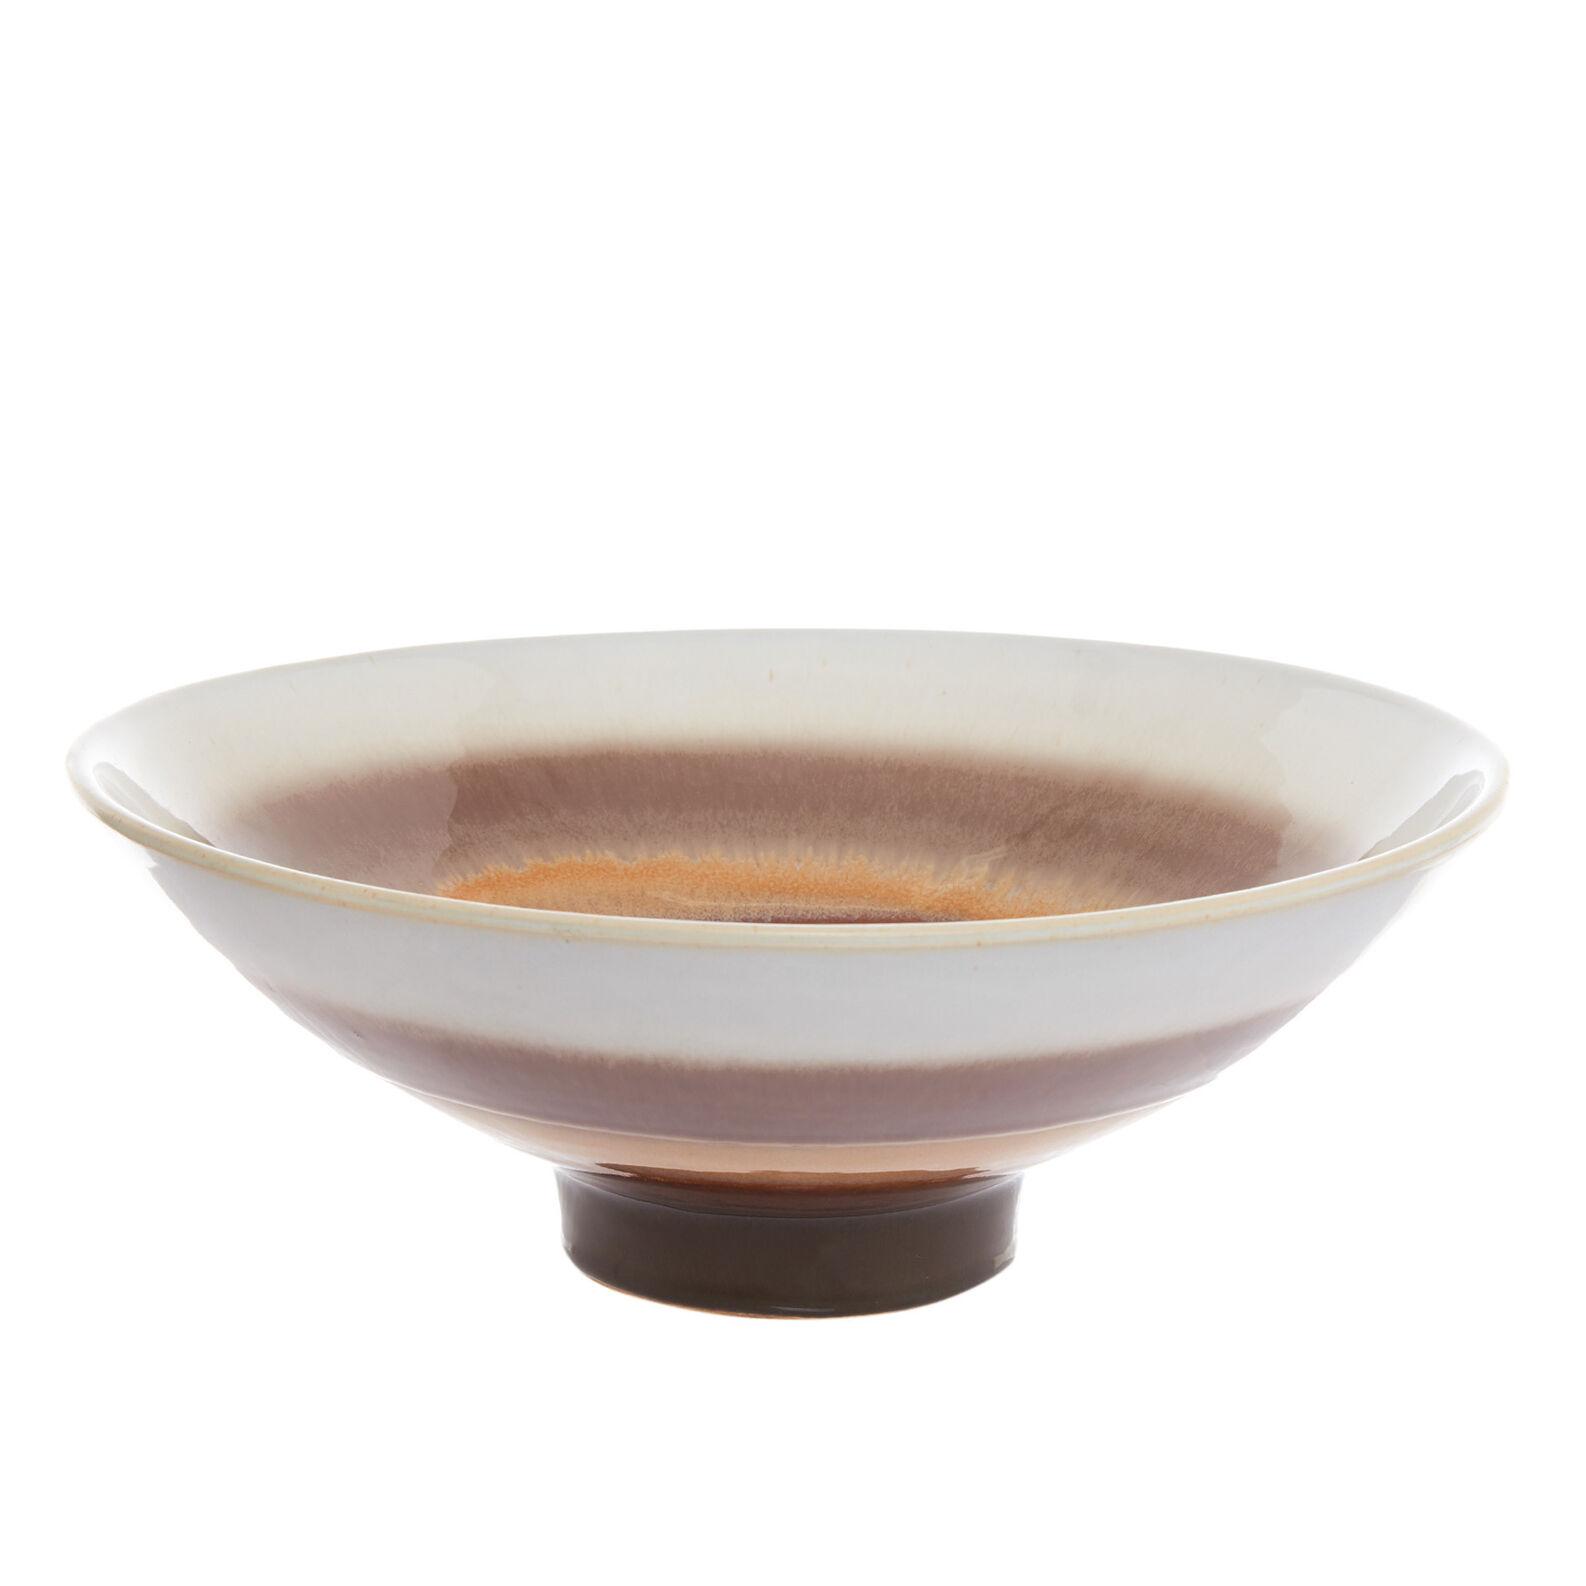 Handmade decorative ceramic bowl